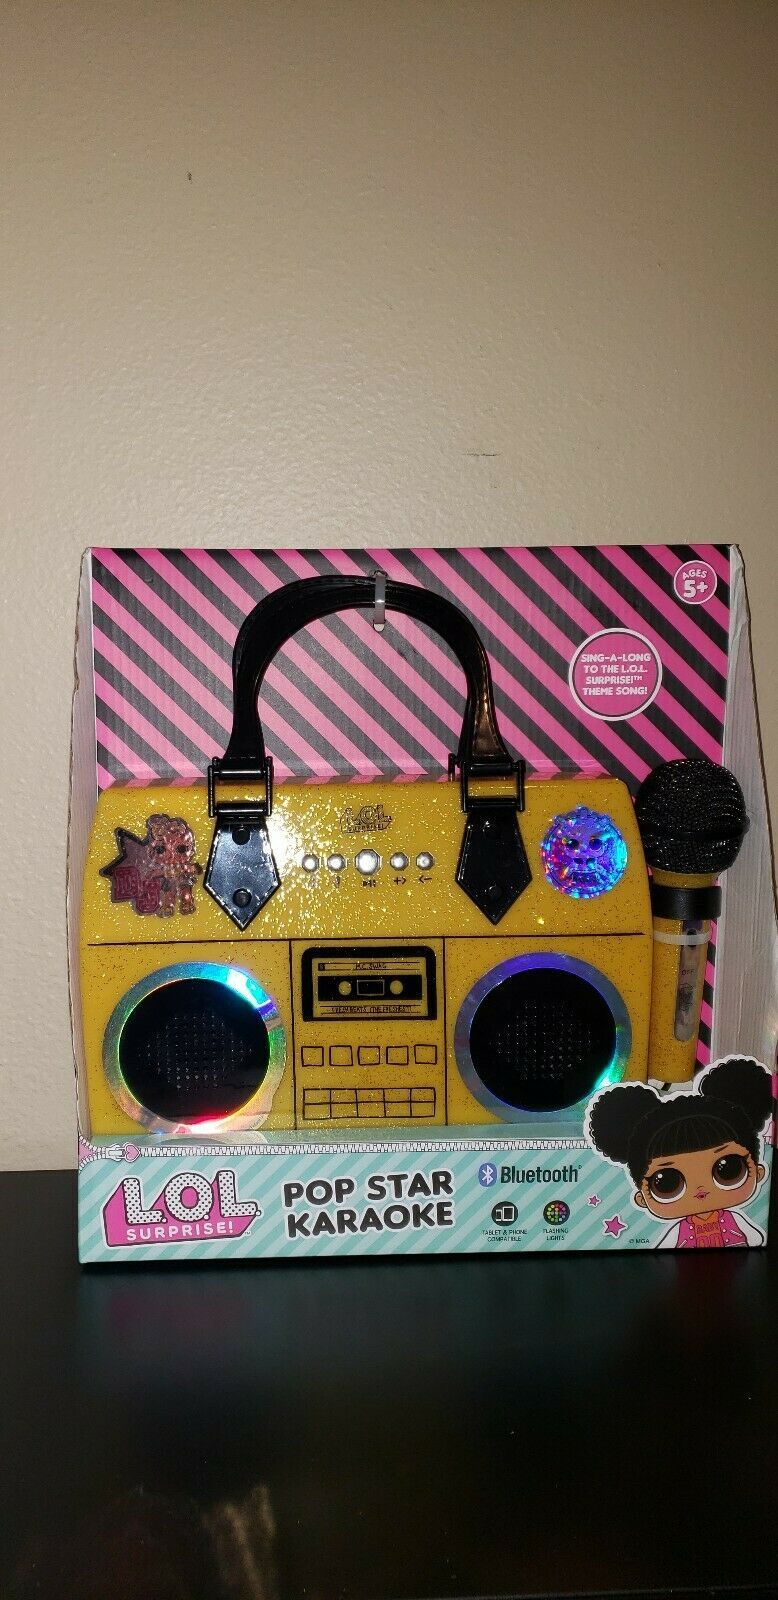 Lol Surprise Karaoke Rare Bluetooth Retro Style boom box with microphone NEW